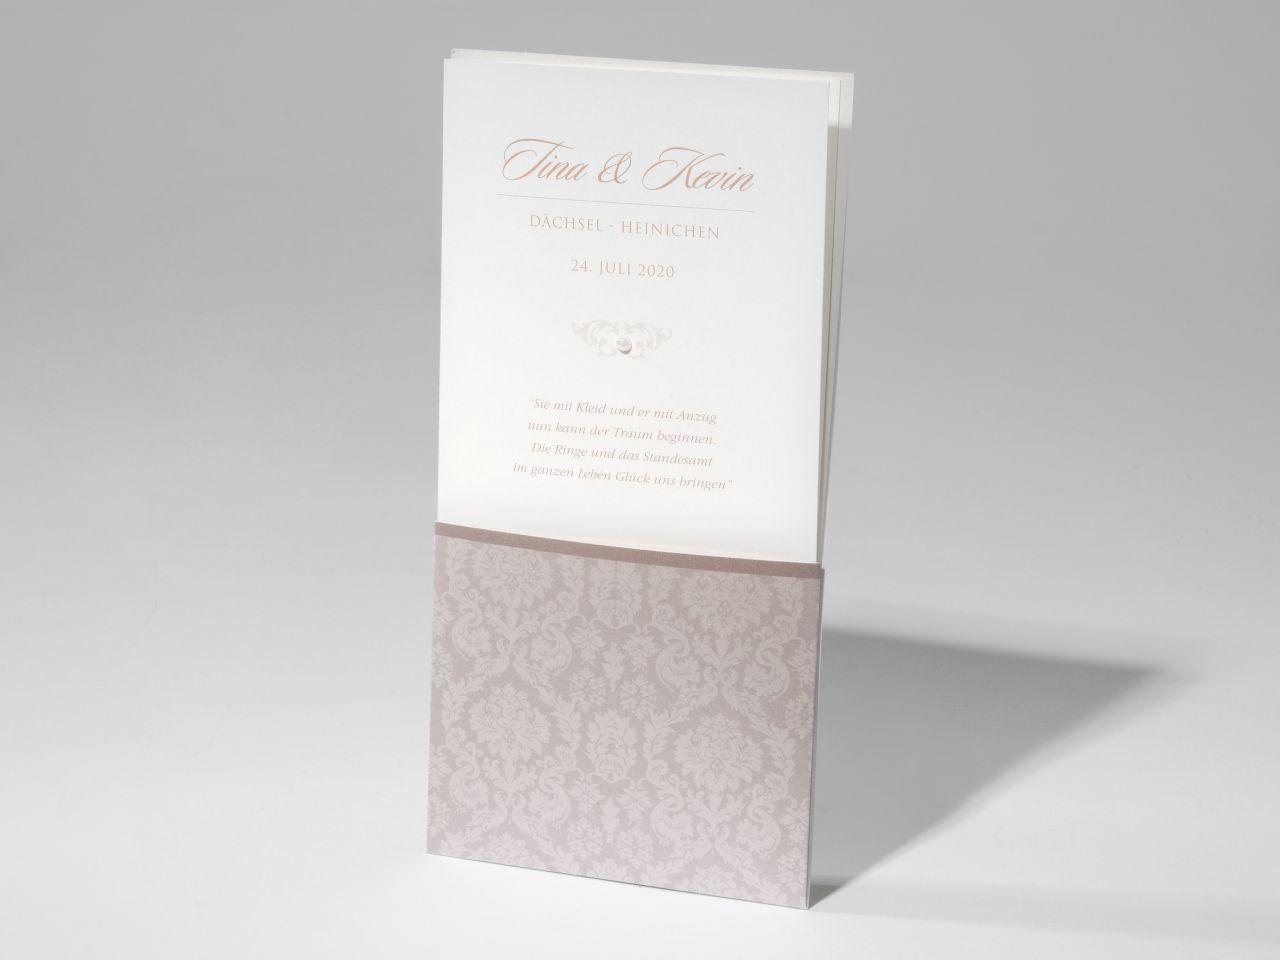 Einladungskarte - F 65.1698